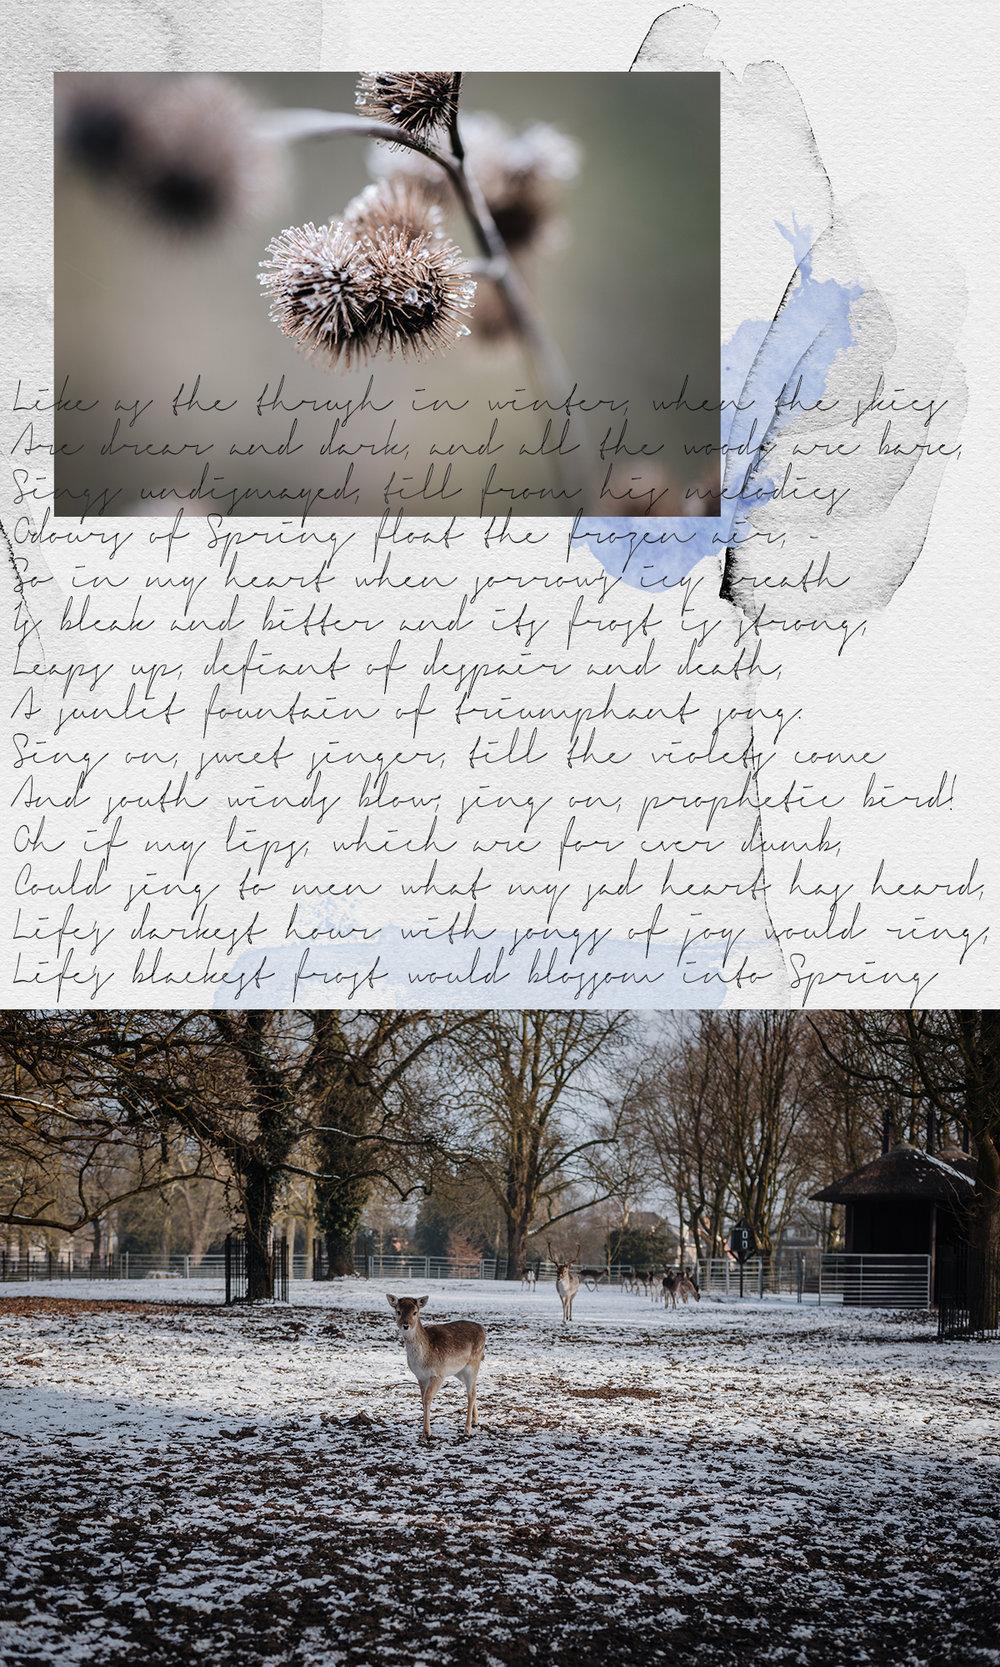 winter-poetry-collage-deer-snow-macro-flower-Patricia-Martins-Yellowish-2019